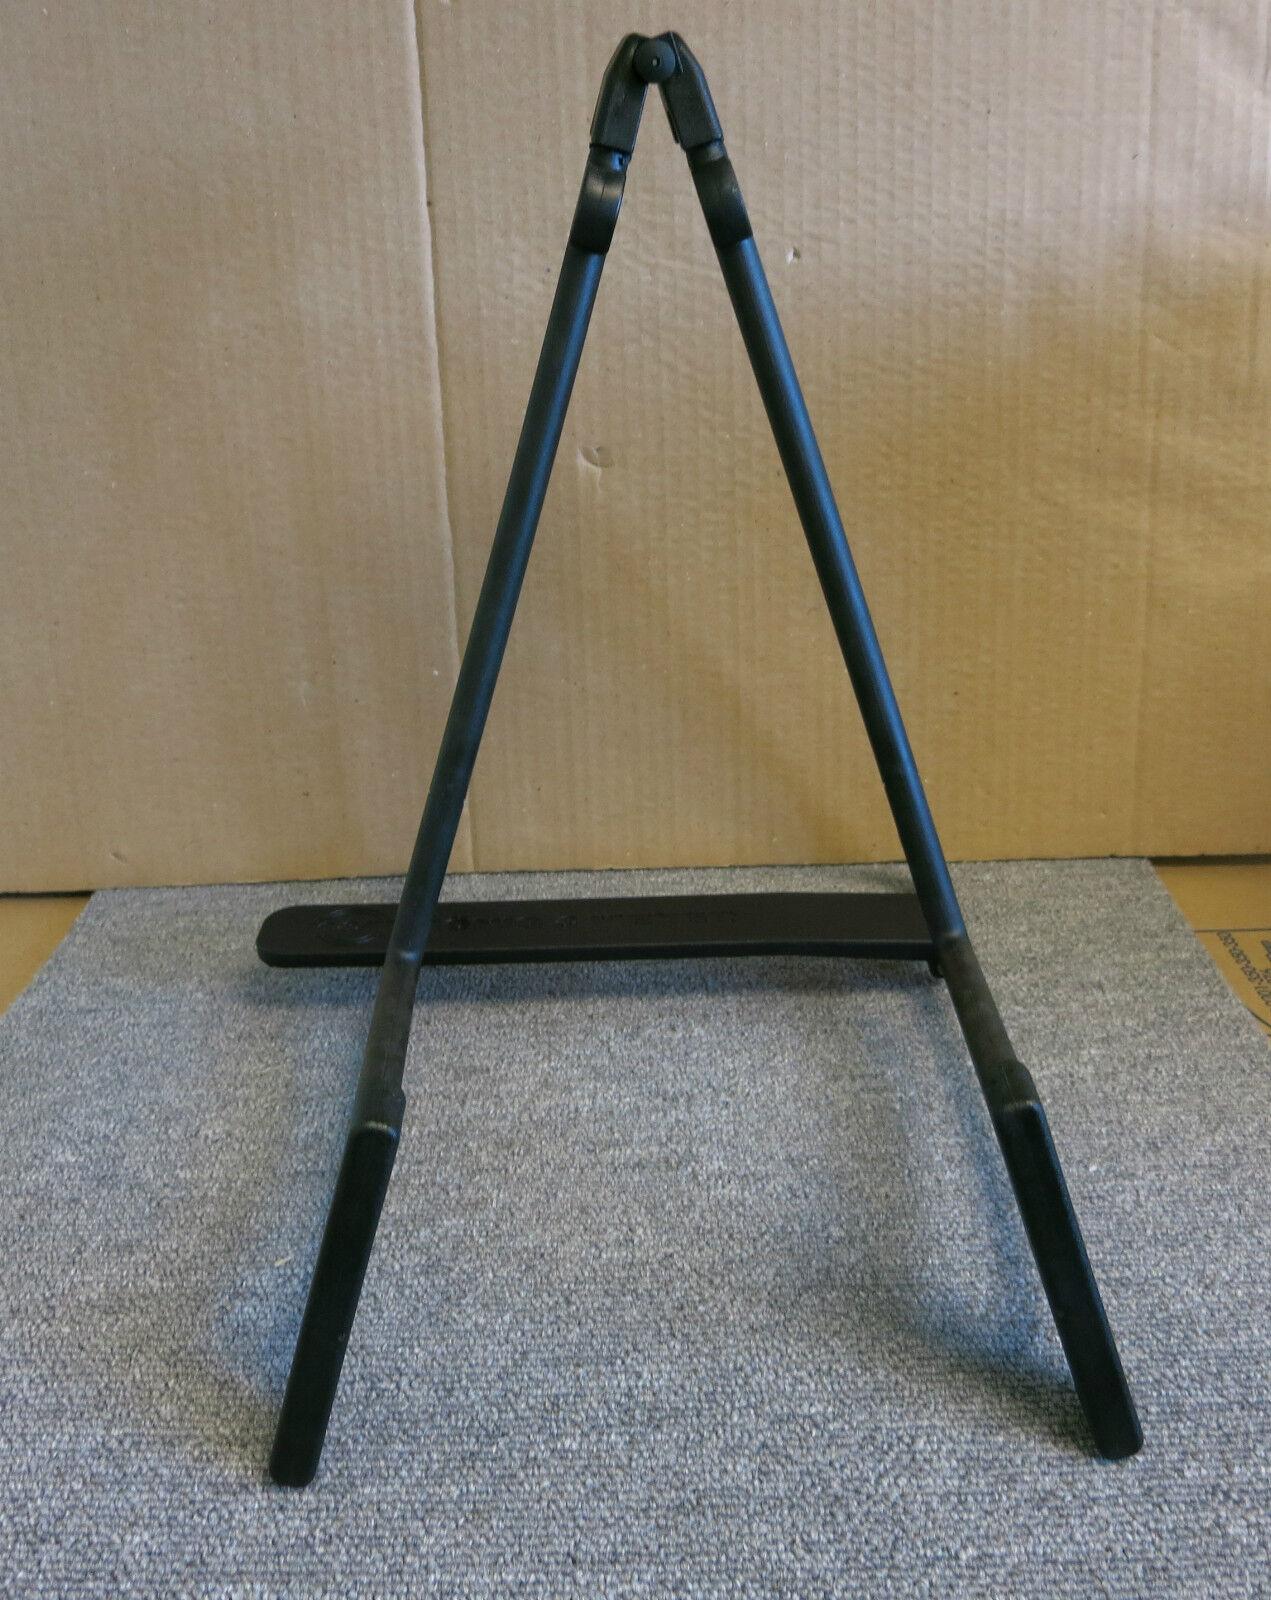 New Konig & Meyer 17580-000-55 Heli Acoustic Guitar Display Stage Stand - Black